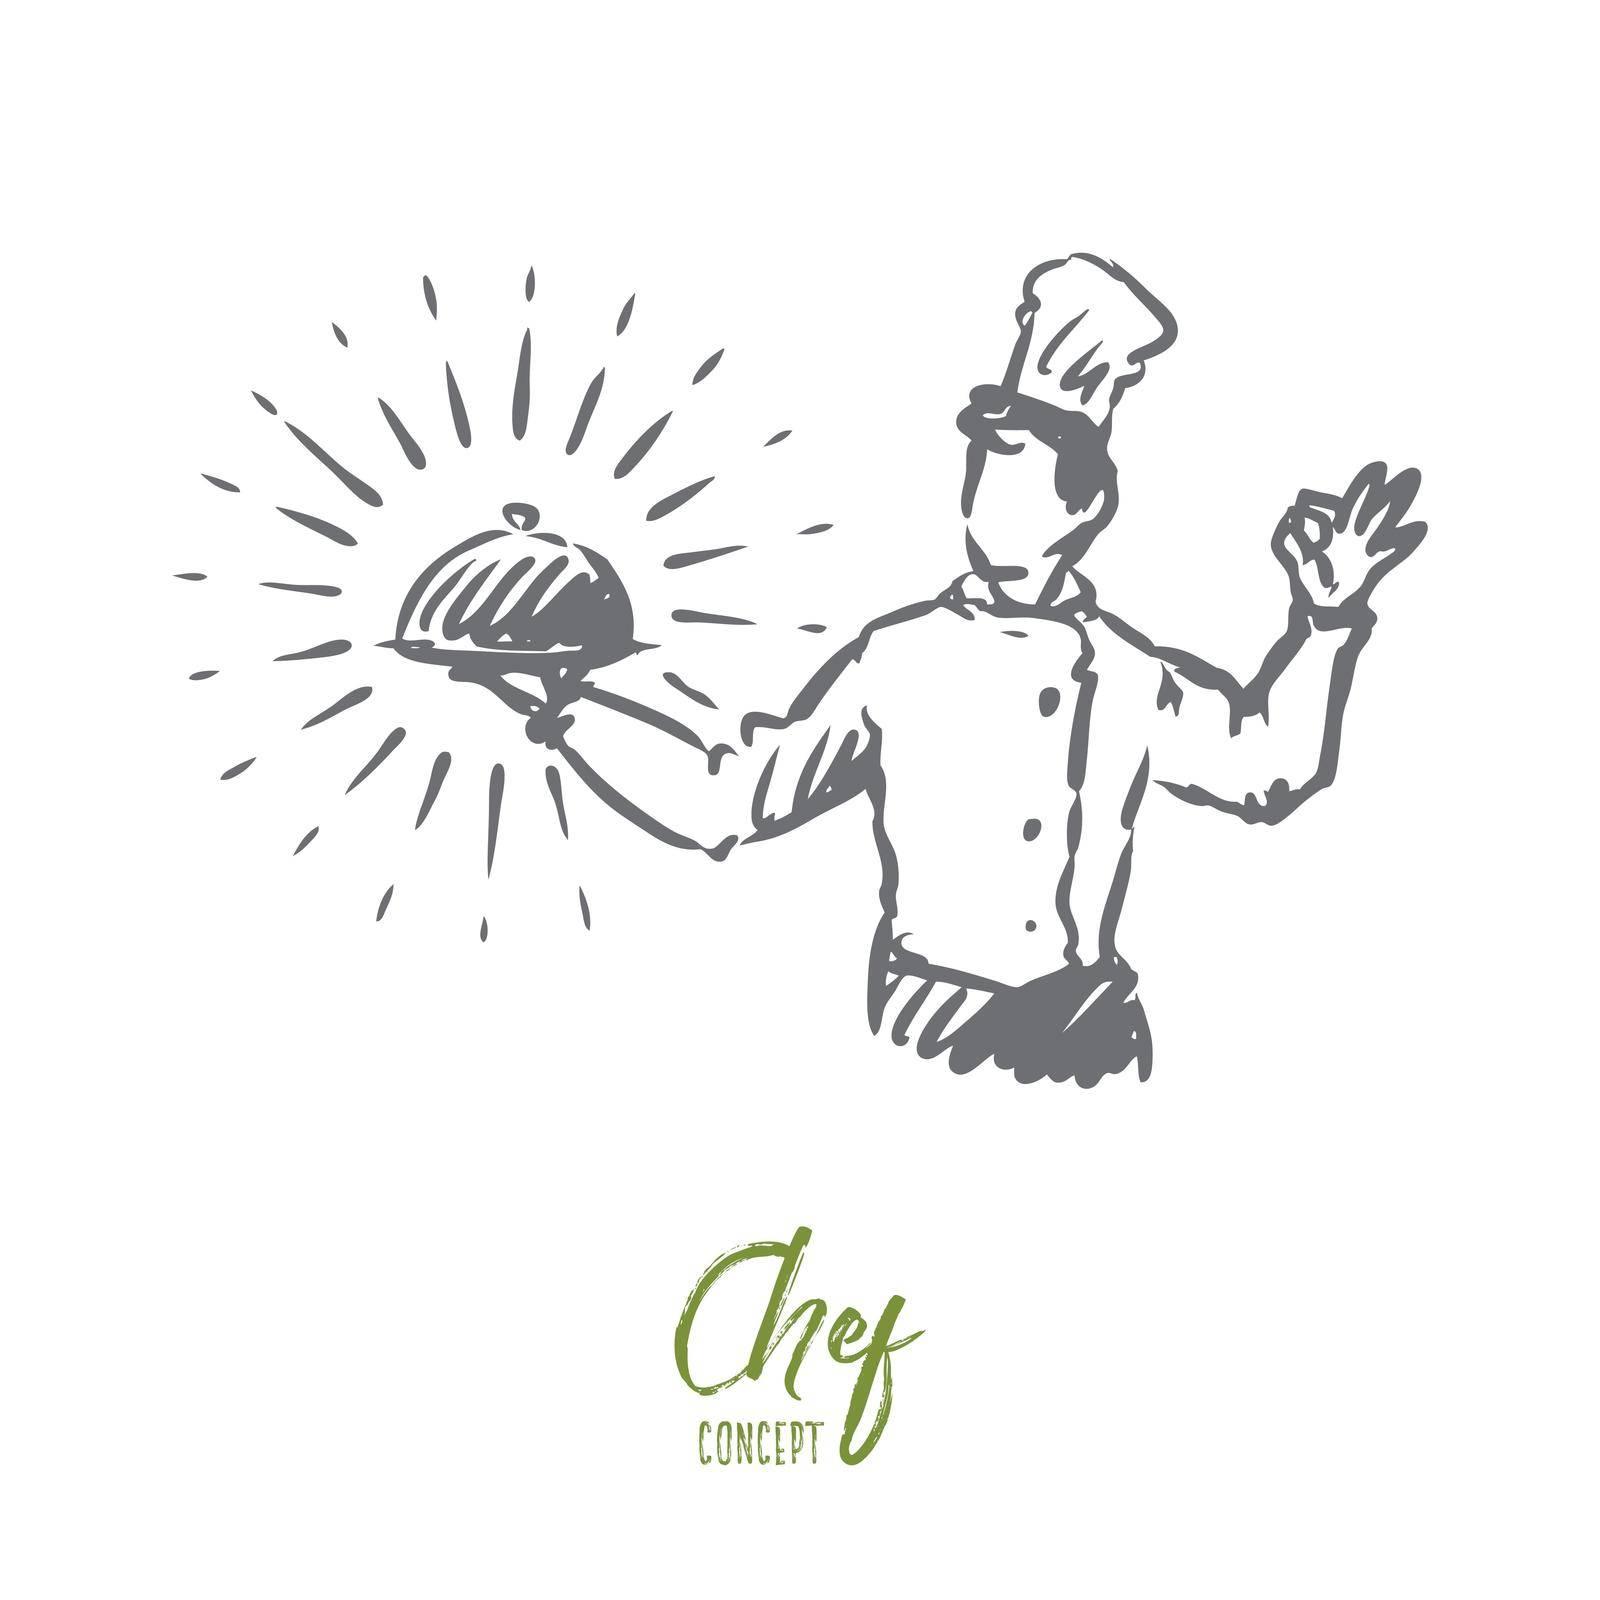 Chef, pot, meal, restaurant concept. Hand drawn isolated vector. by Vasilyeva